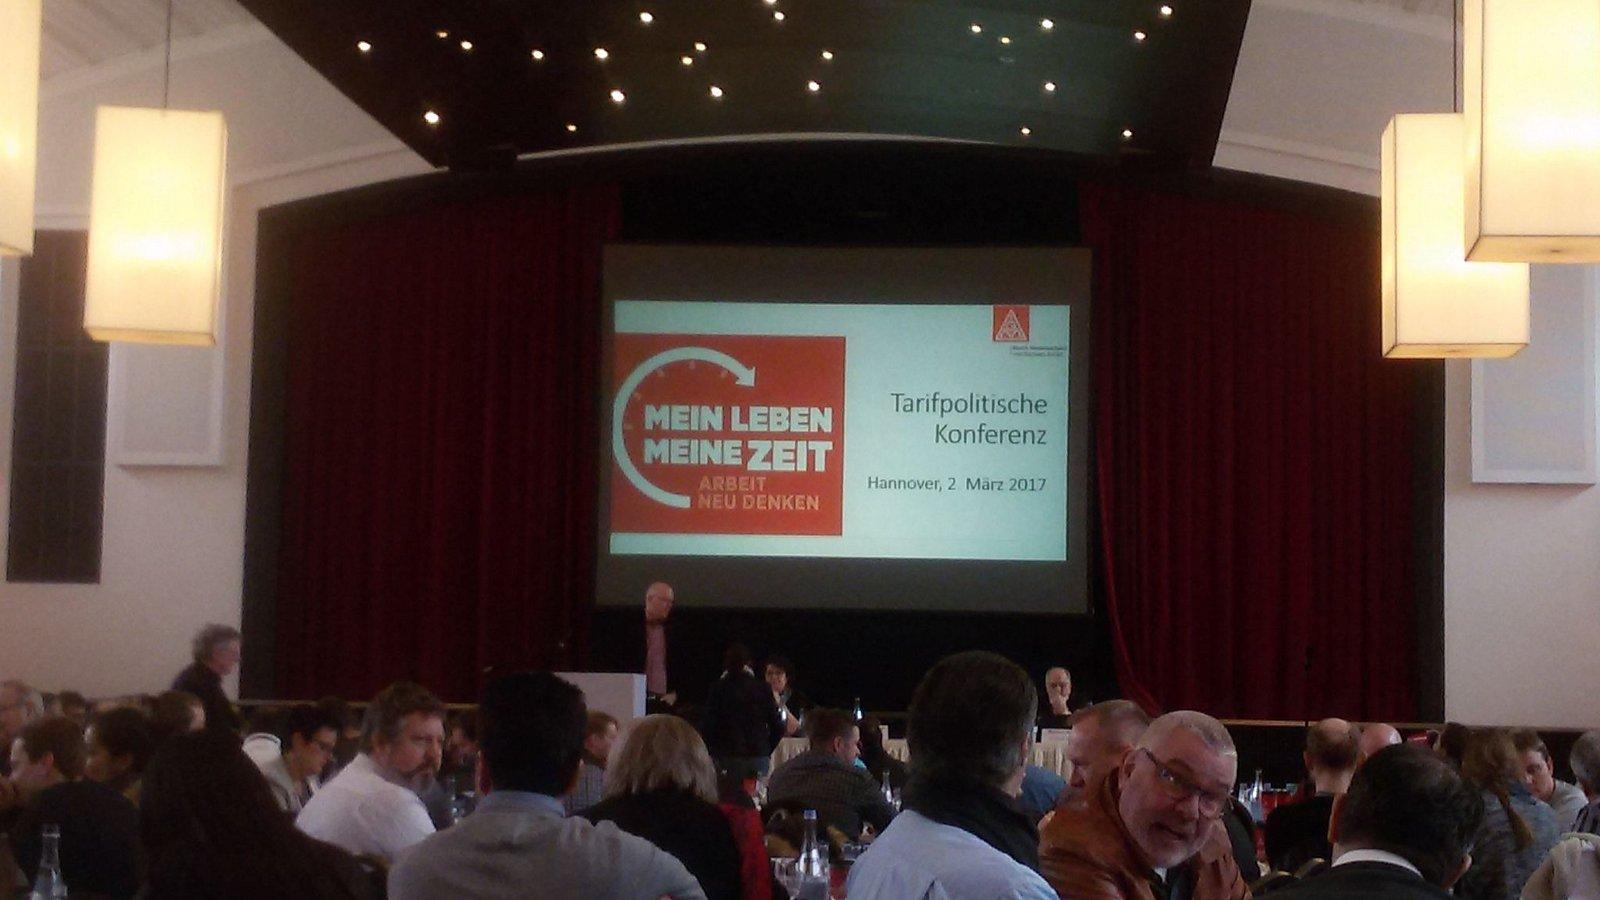 Deutsche messe ig metall hannover for Designhotel wienecke xi hannover